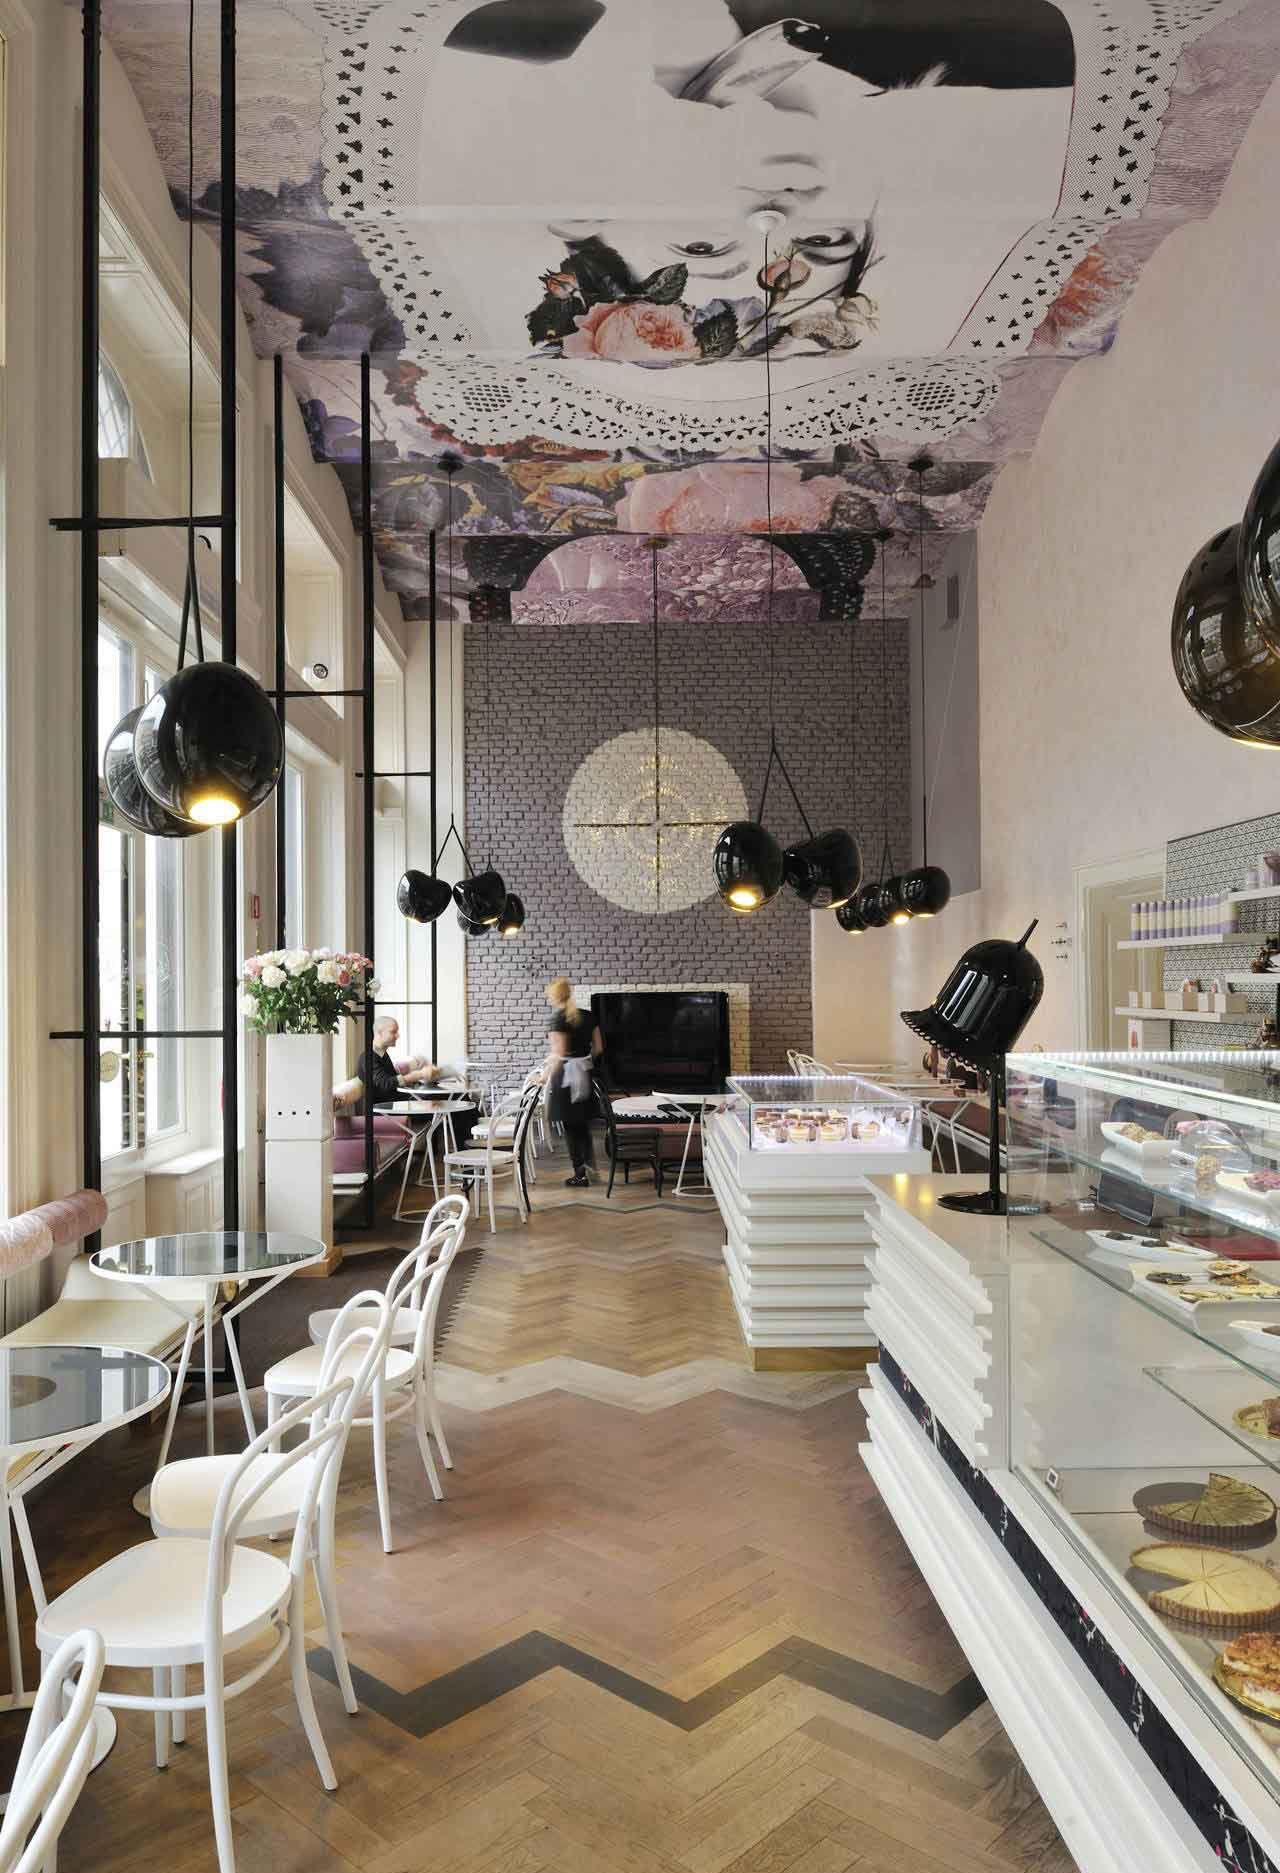 Lolita Cafe Ljubljana Slovenia by Trije Arhitekti #ohlalámagnoliá #Inspiration #restaurantes #bares #cafe #restaurants